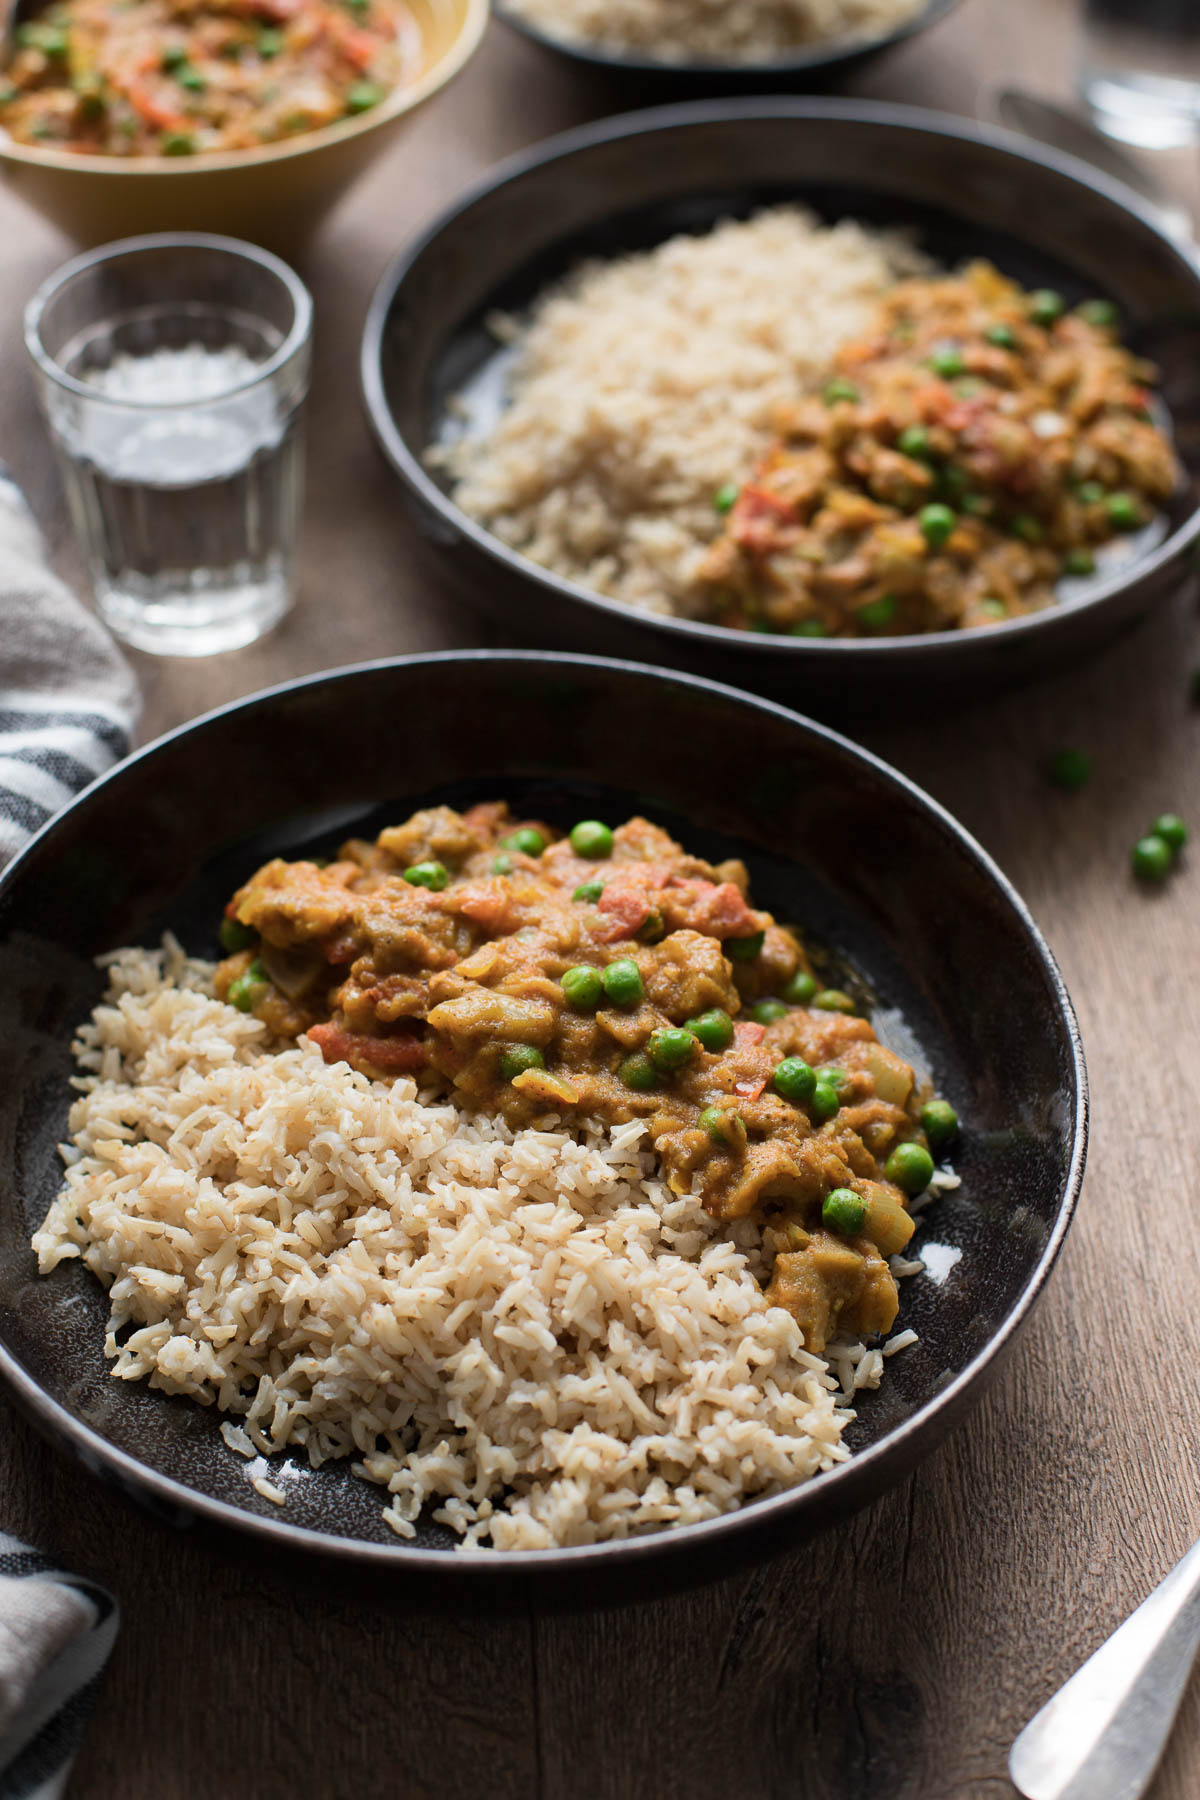 Spicy Indian Eggplant Curry, Baingan Bharta Recipe